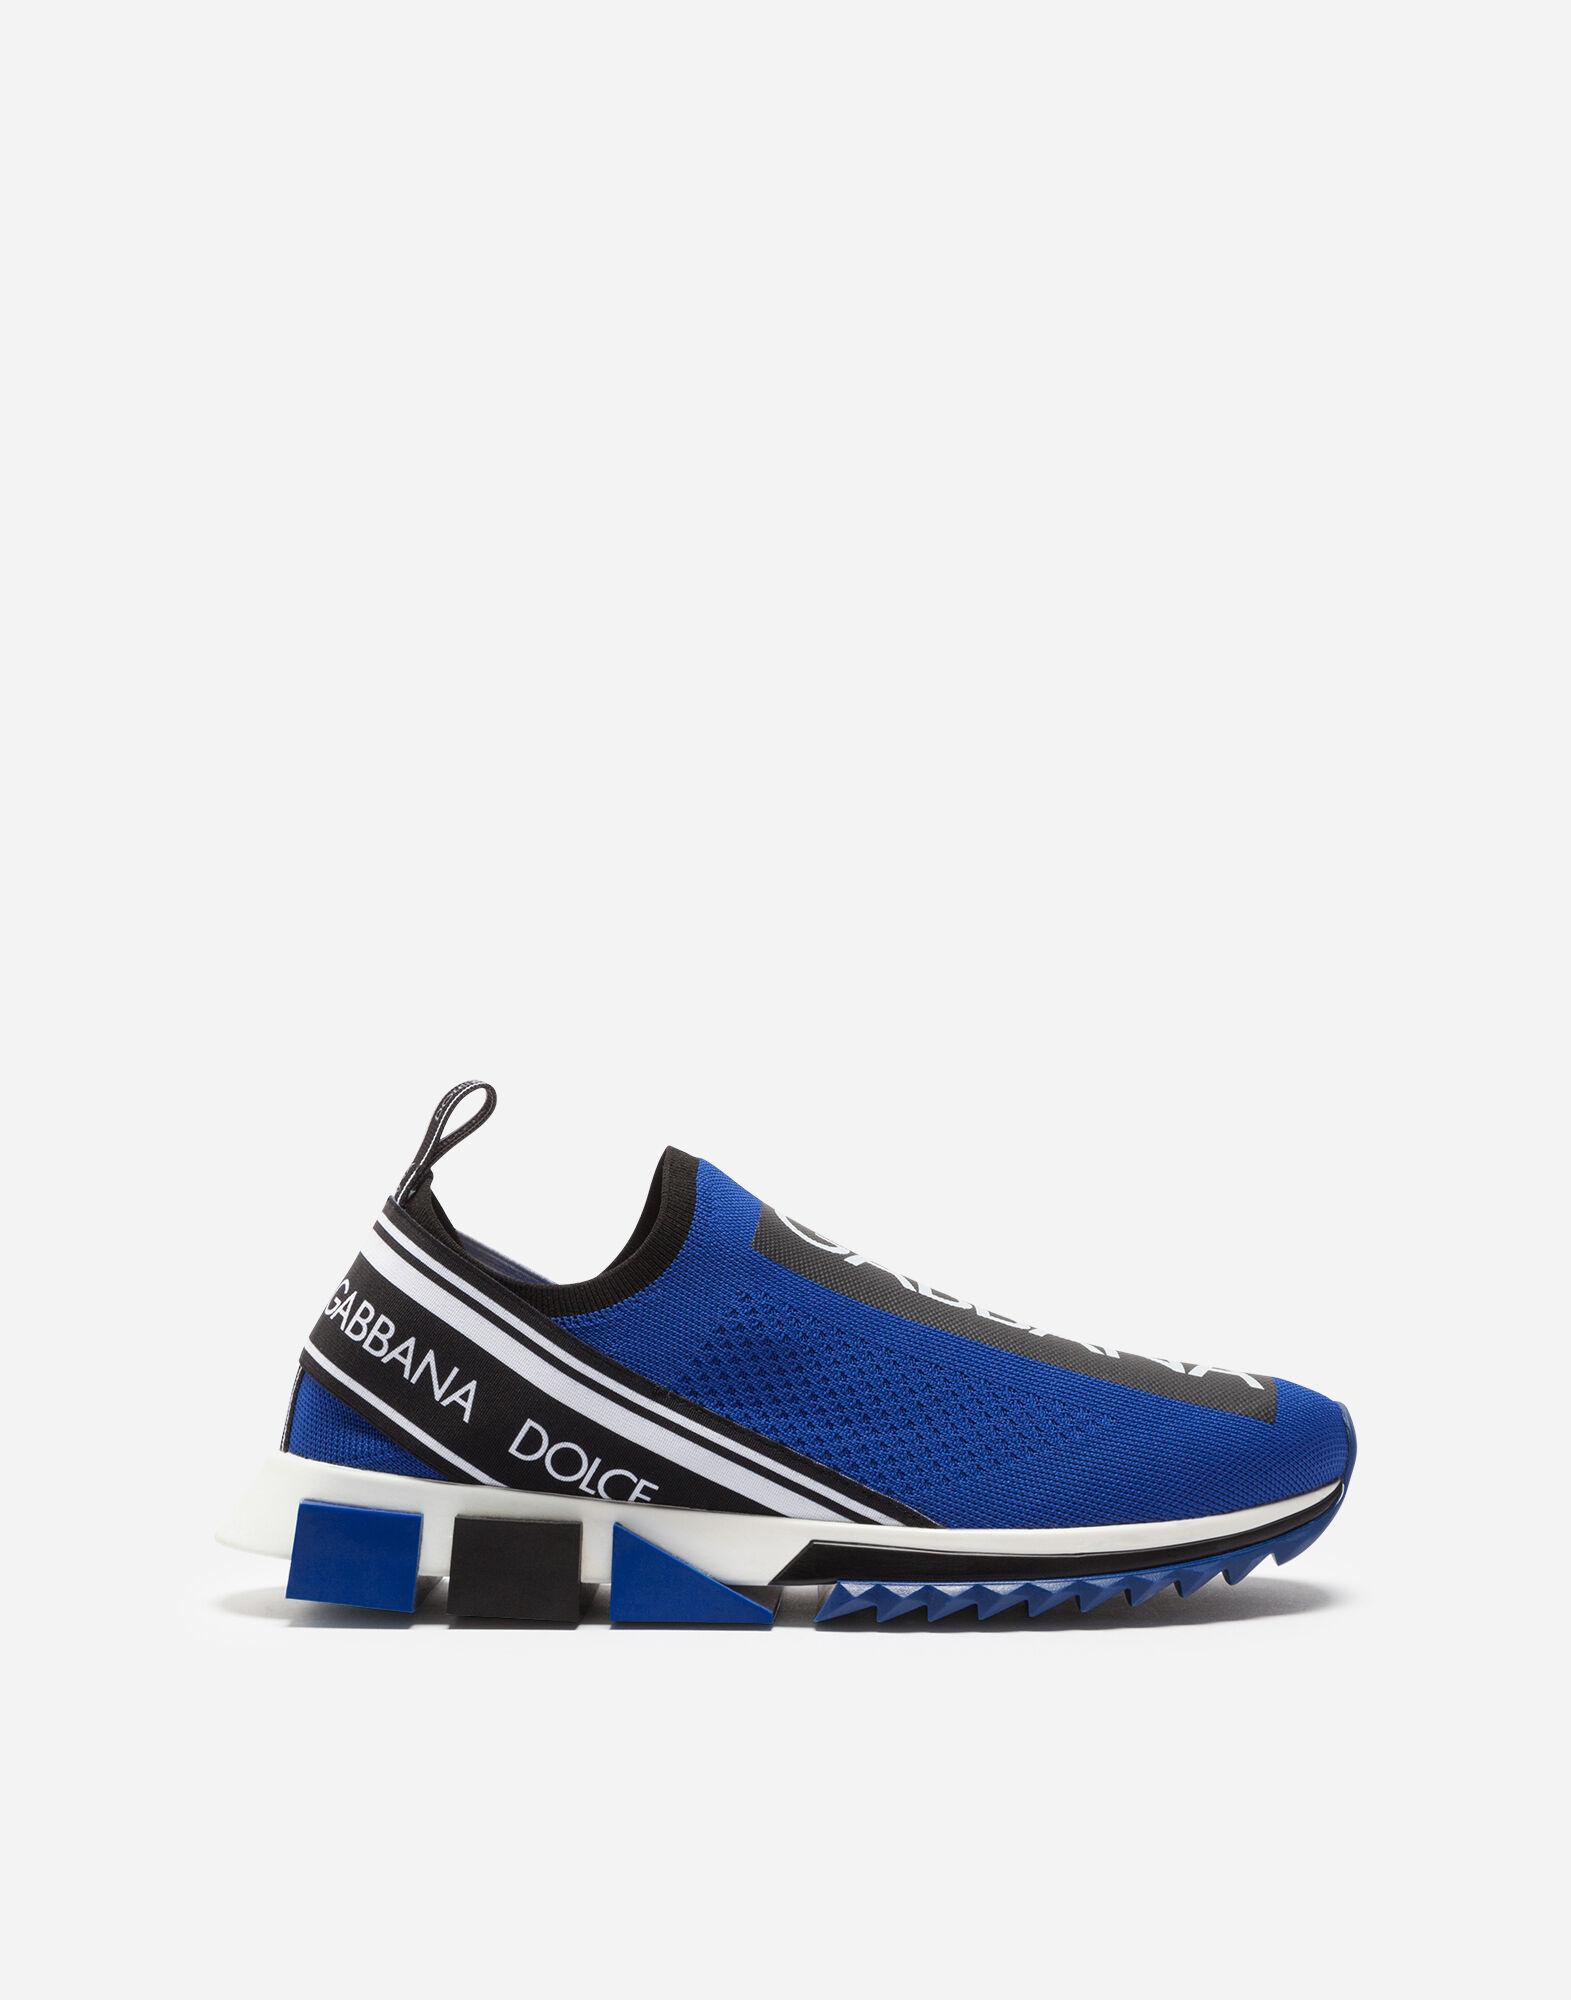 Dolce & GabbanaBranded Sorrento sneakers 4MDRD